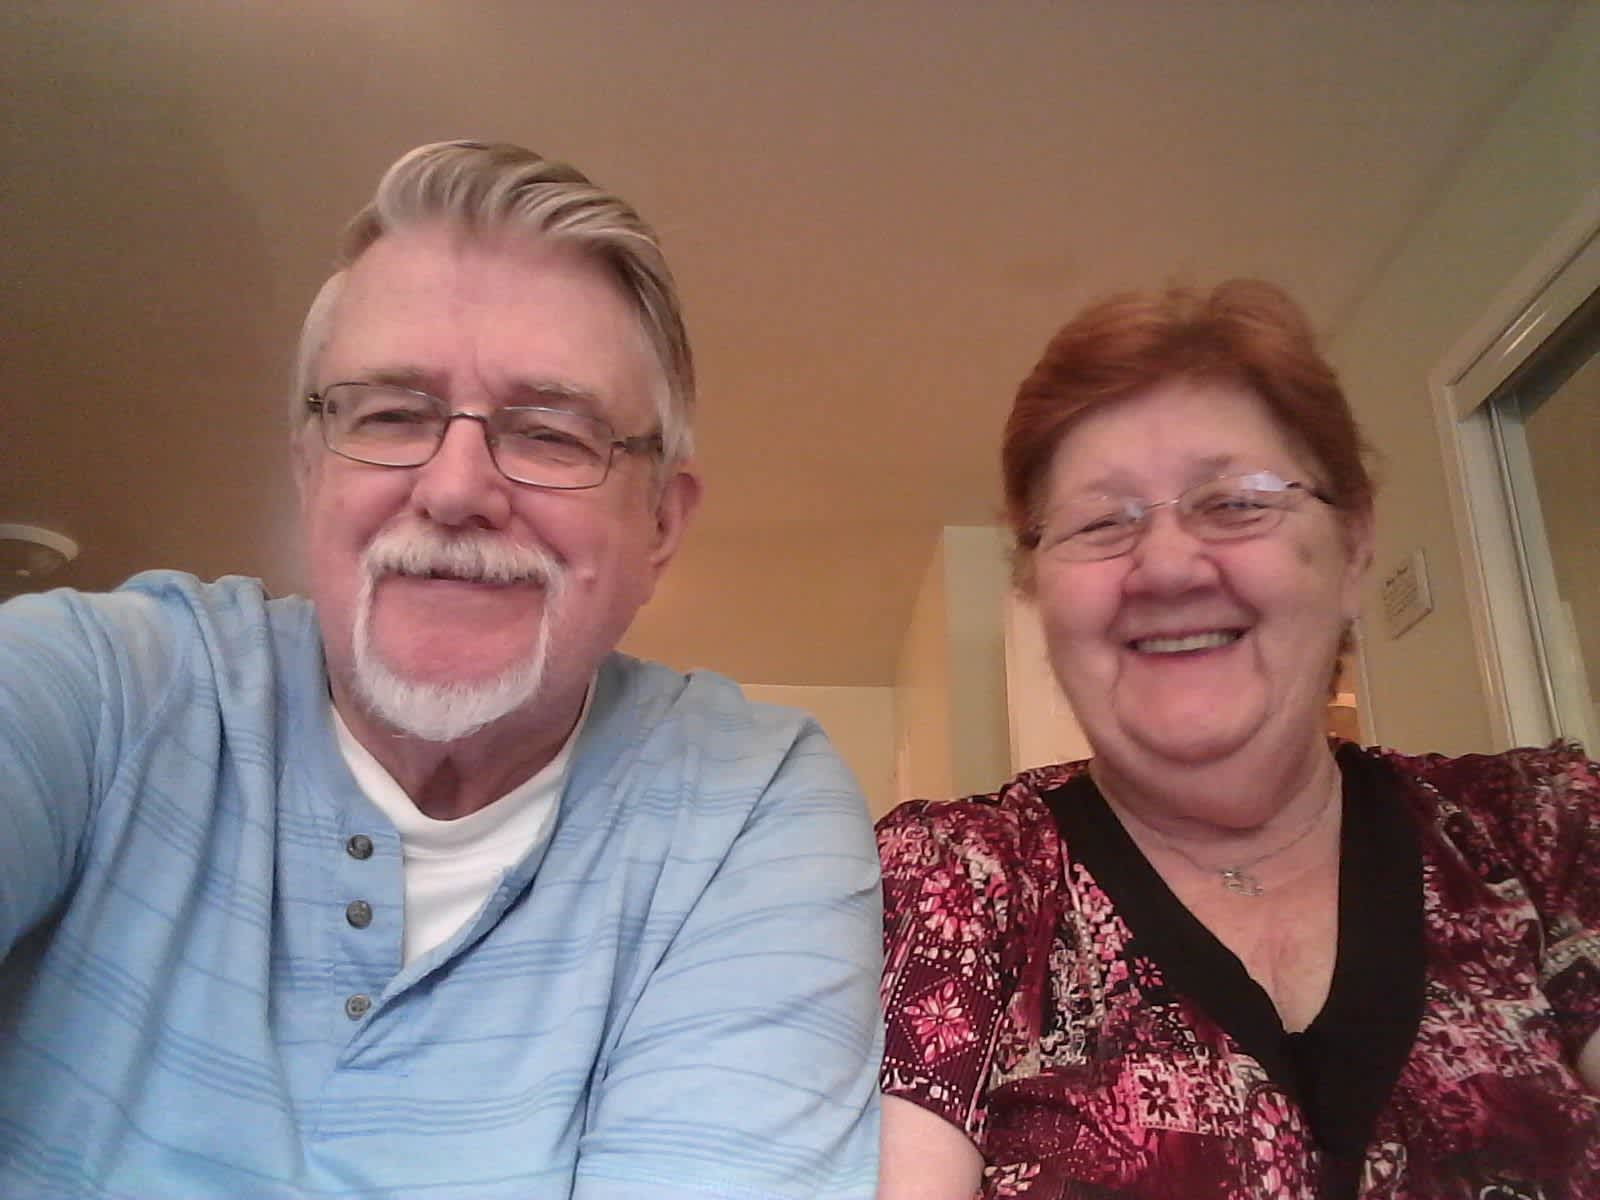 Lyn and alex & Alex. from Halifax, Nova Scotia, Canada